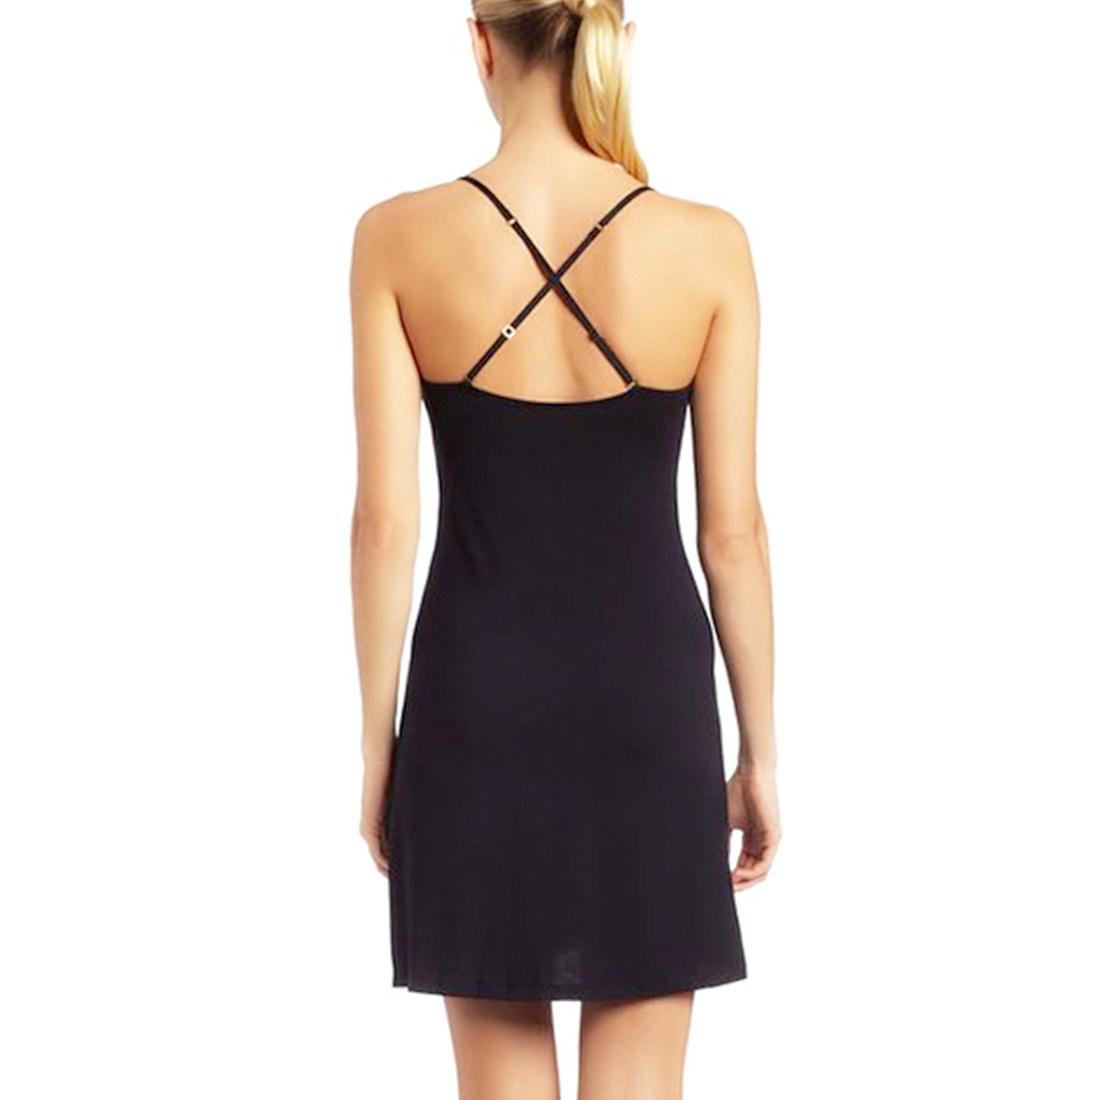 Womens Sleepwear Robes Sexy Lingerie V-neck Nightdress ...